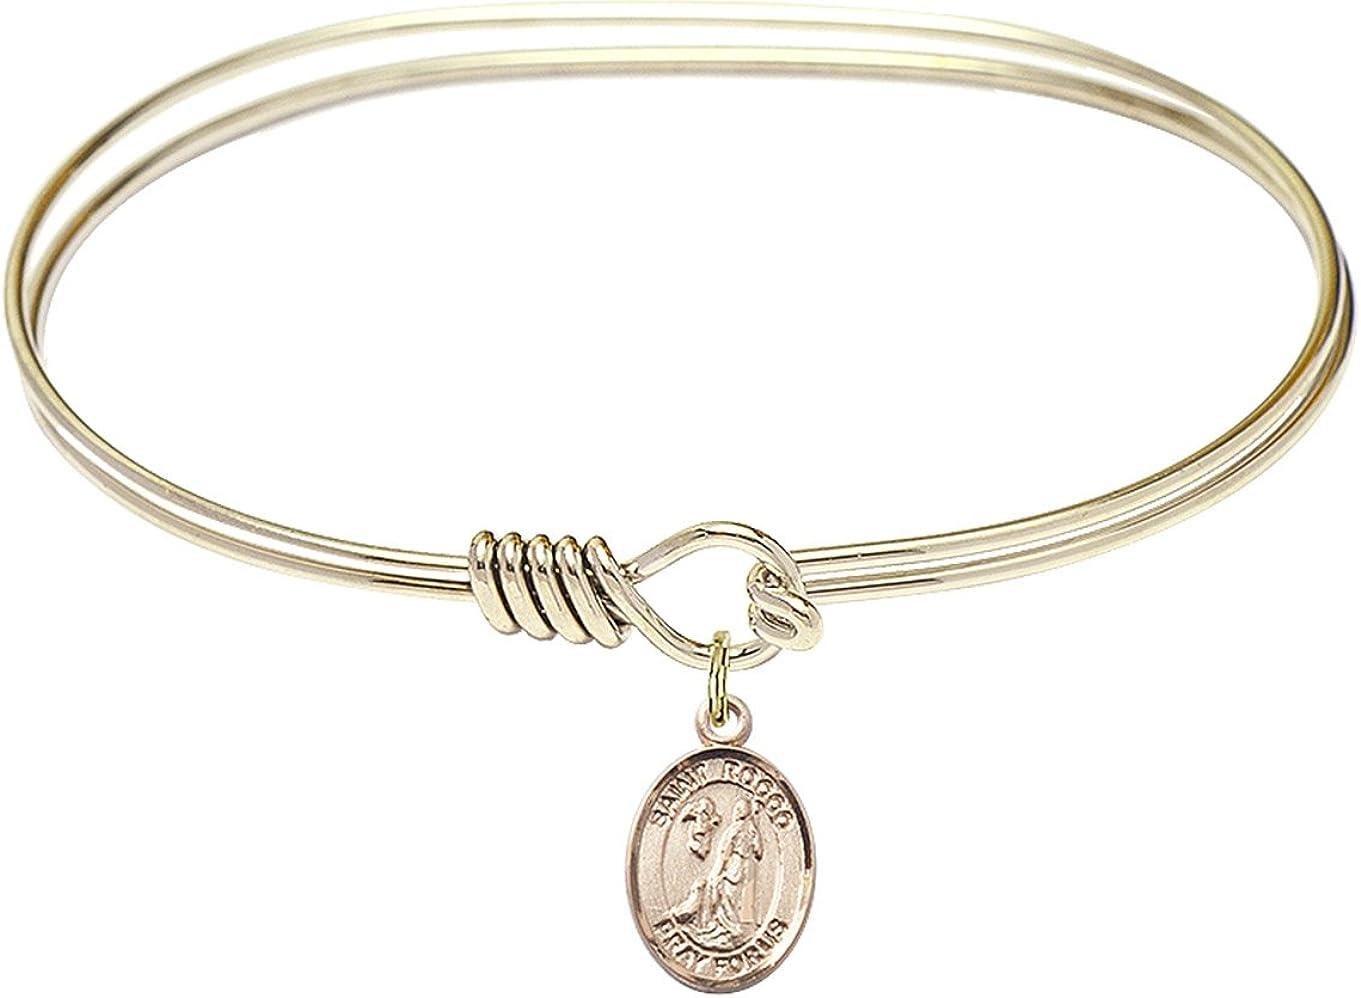 DiamondJewelryNY Eye Hook Cheap mail order sales Bangle Bracelet with Rocco Max 88% OFF a St. Charm